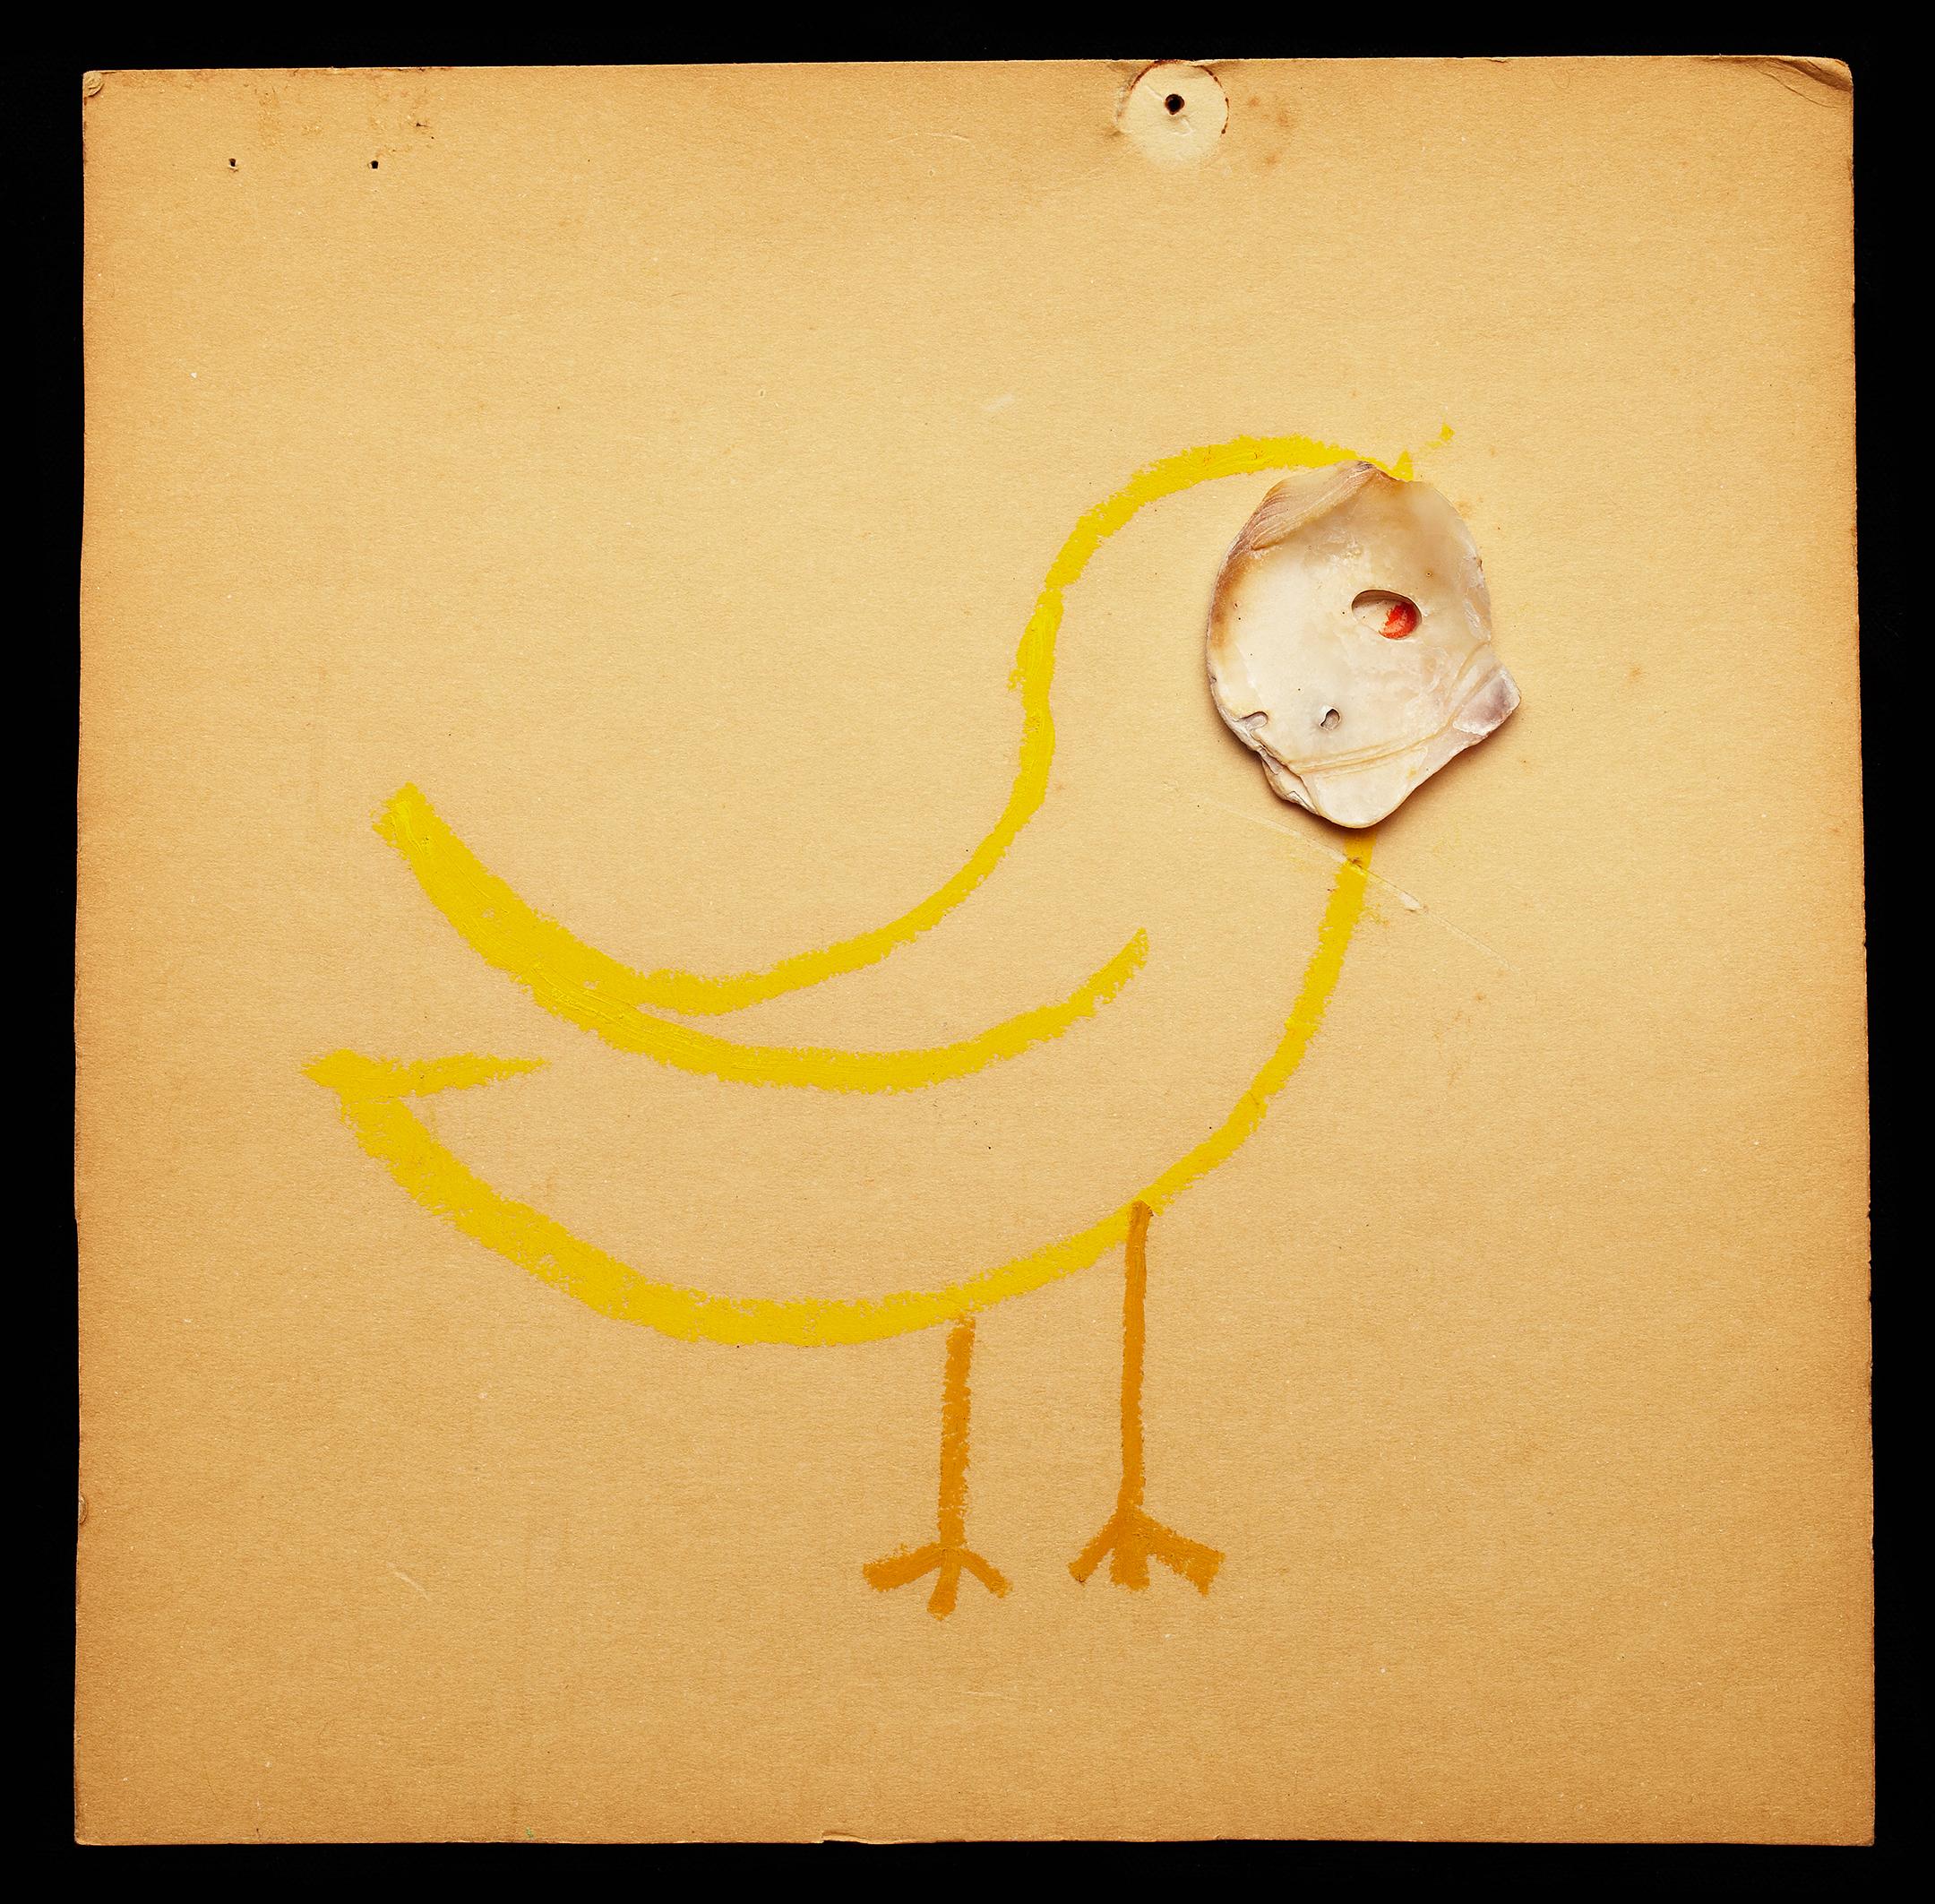 ShellArt-YellowBird by Thomas Wilson Laney